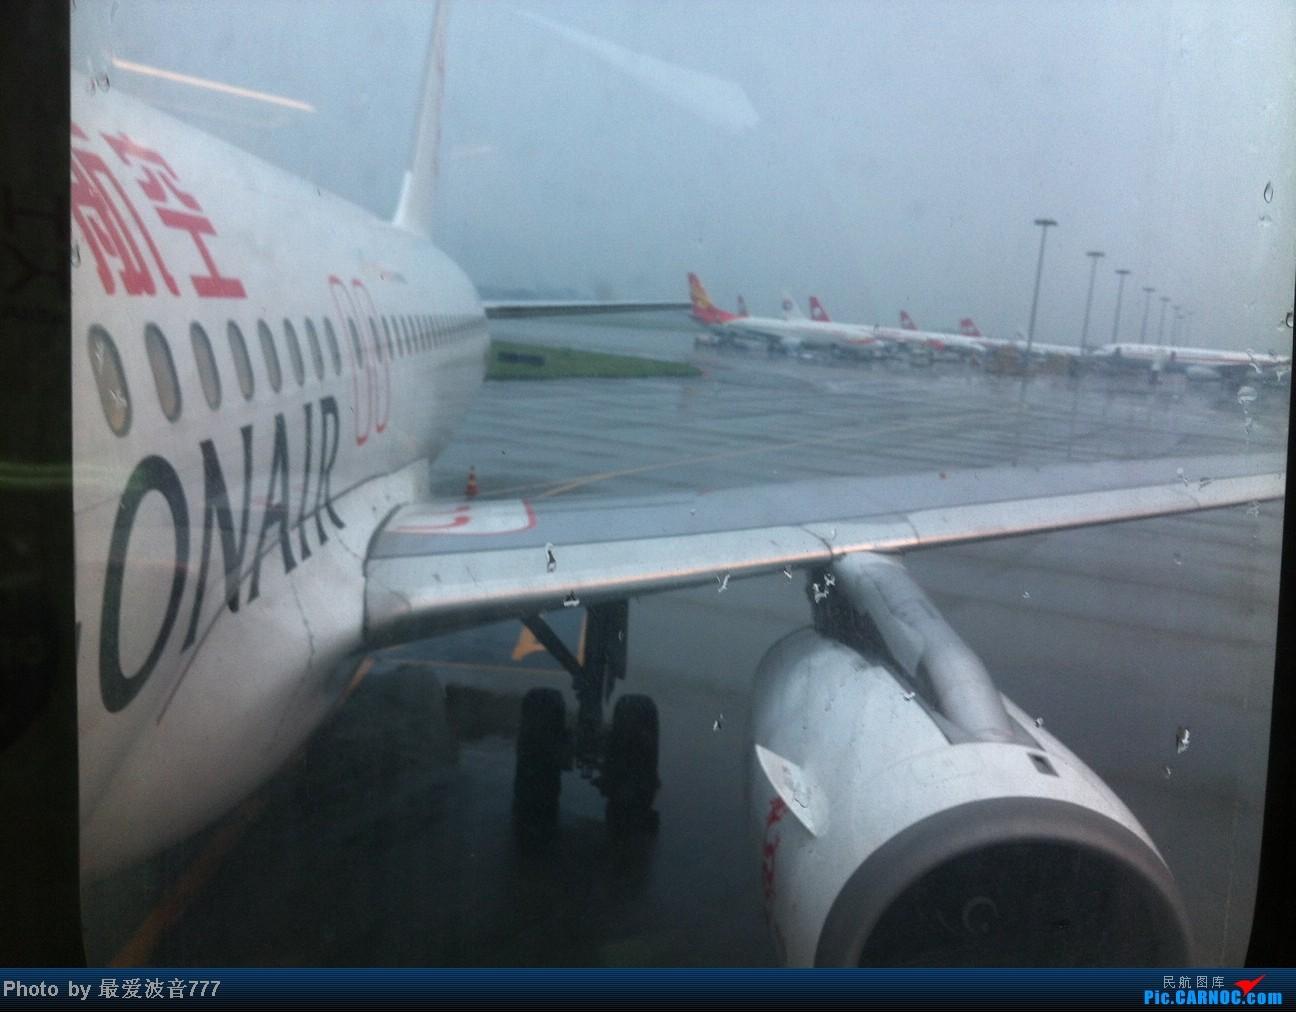 Re:[原创]假期的回国往返之旅 LHR-HKG-CTU-HKG-LHR, CX+CA+KA联合运营 AIRBUS A320-200 B-HSK 中国成都双流机场